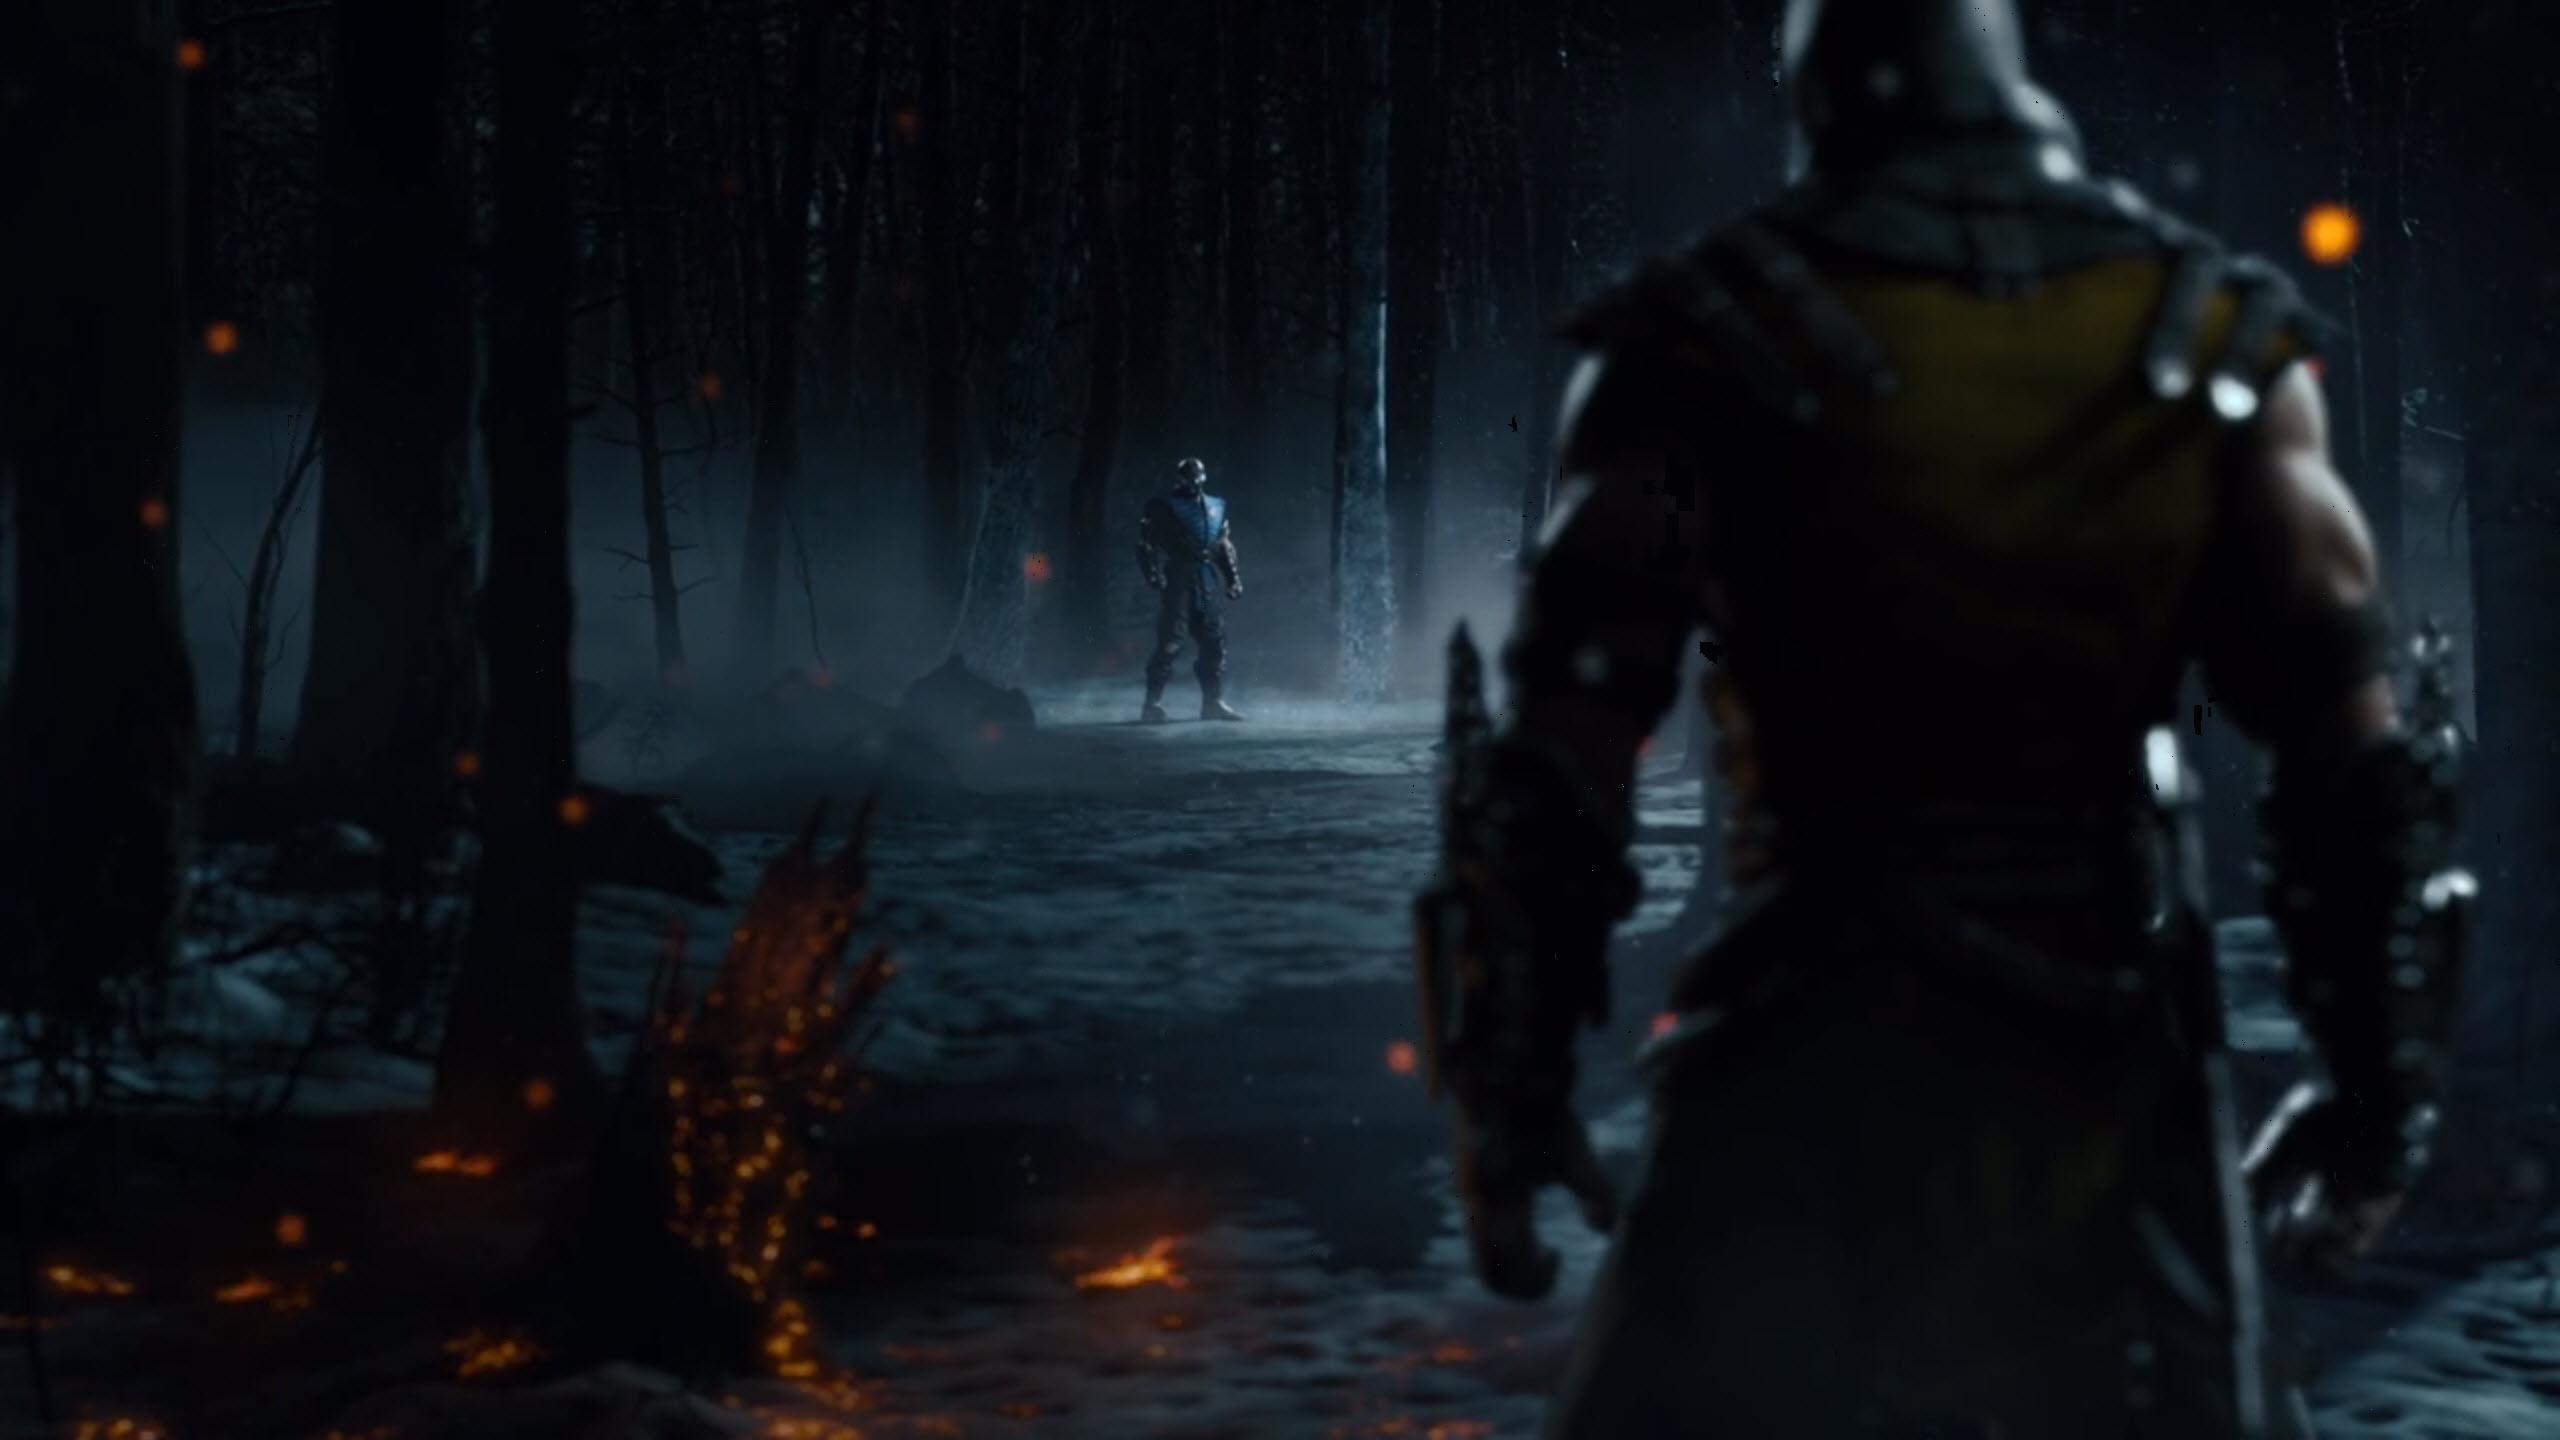 Mortal Kombat X Hd Wallpaper Background Image 2560x1440